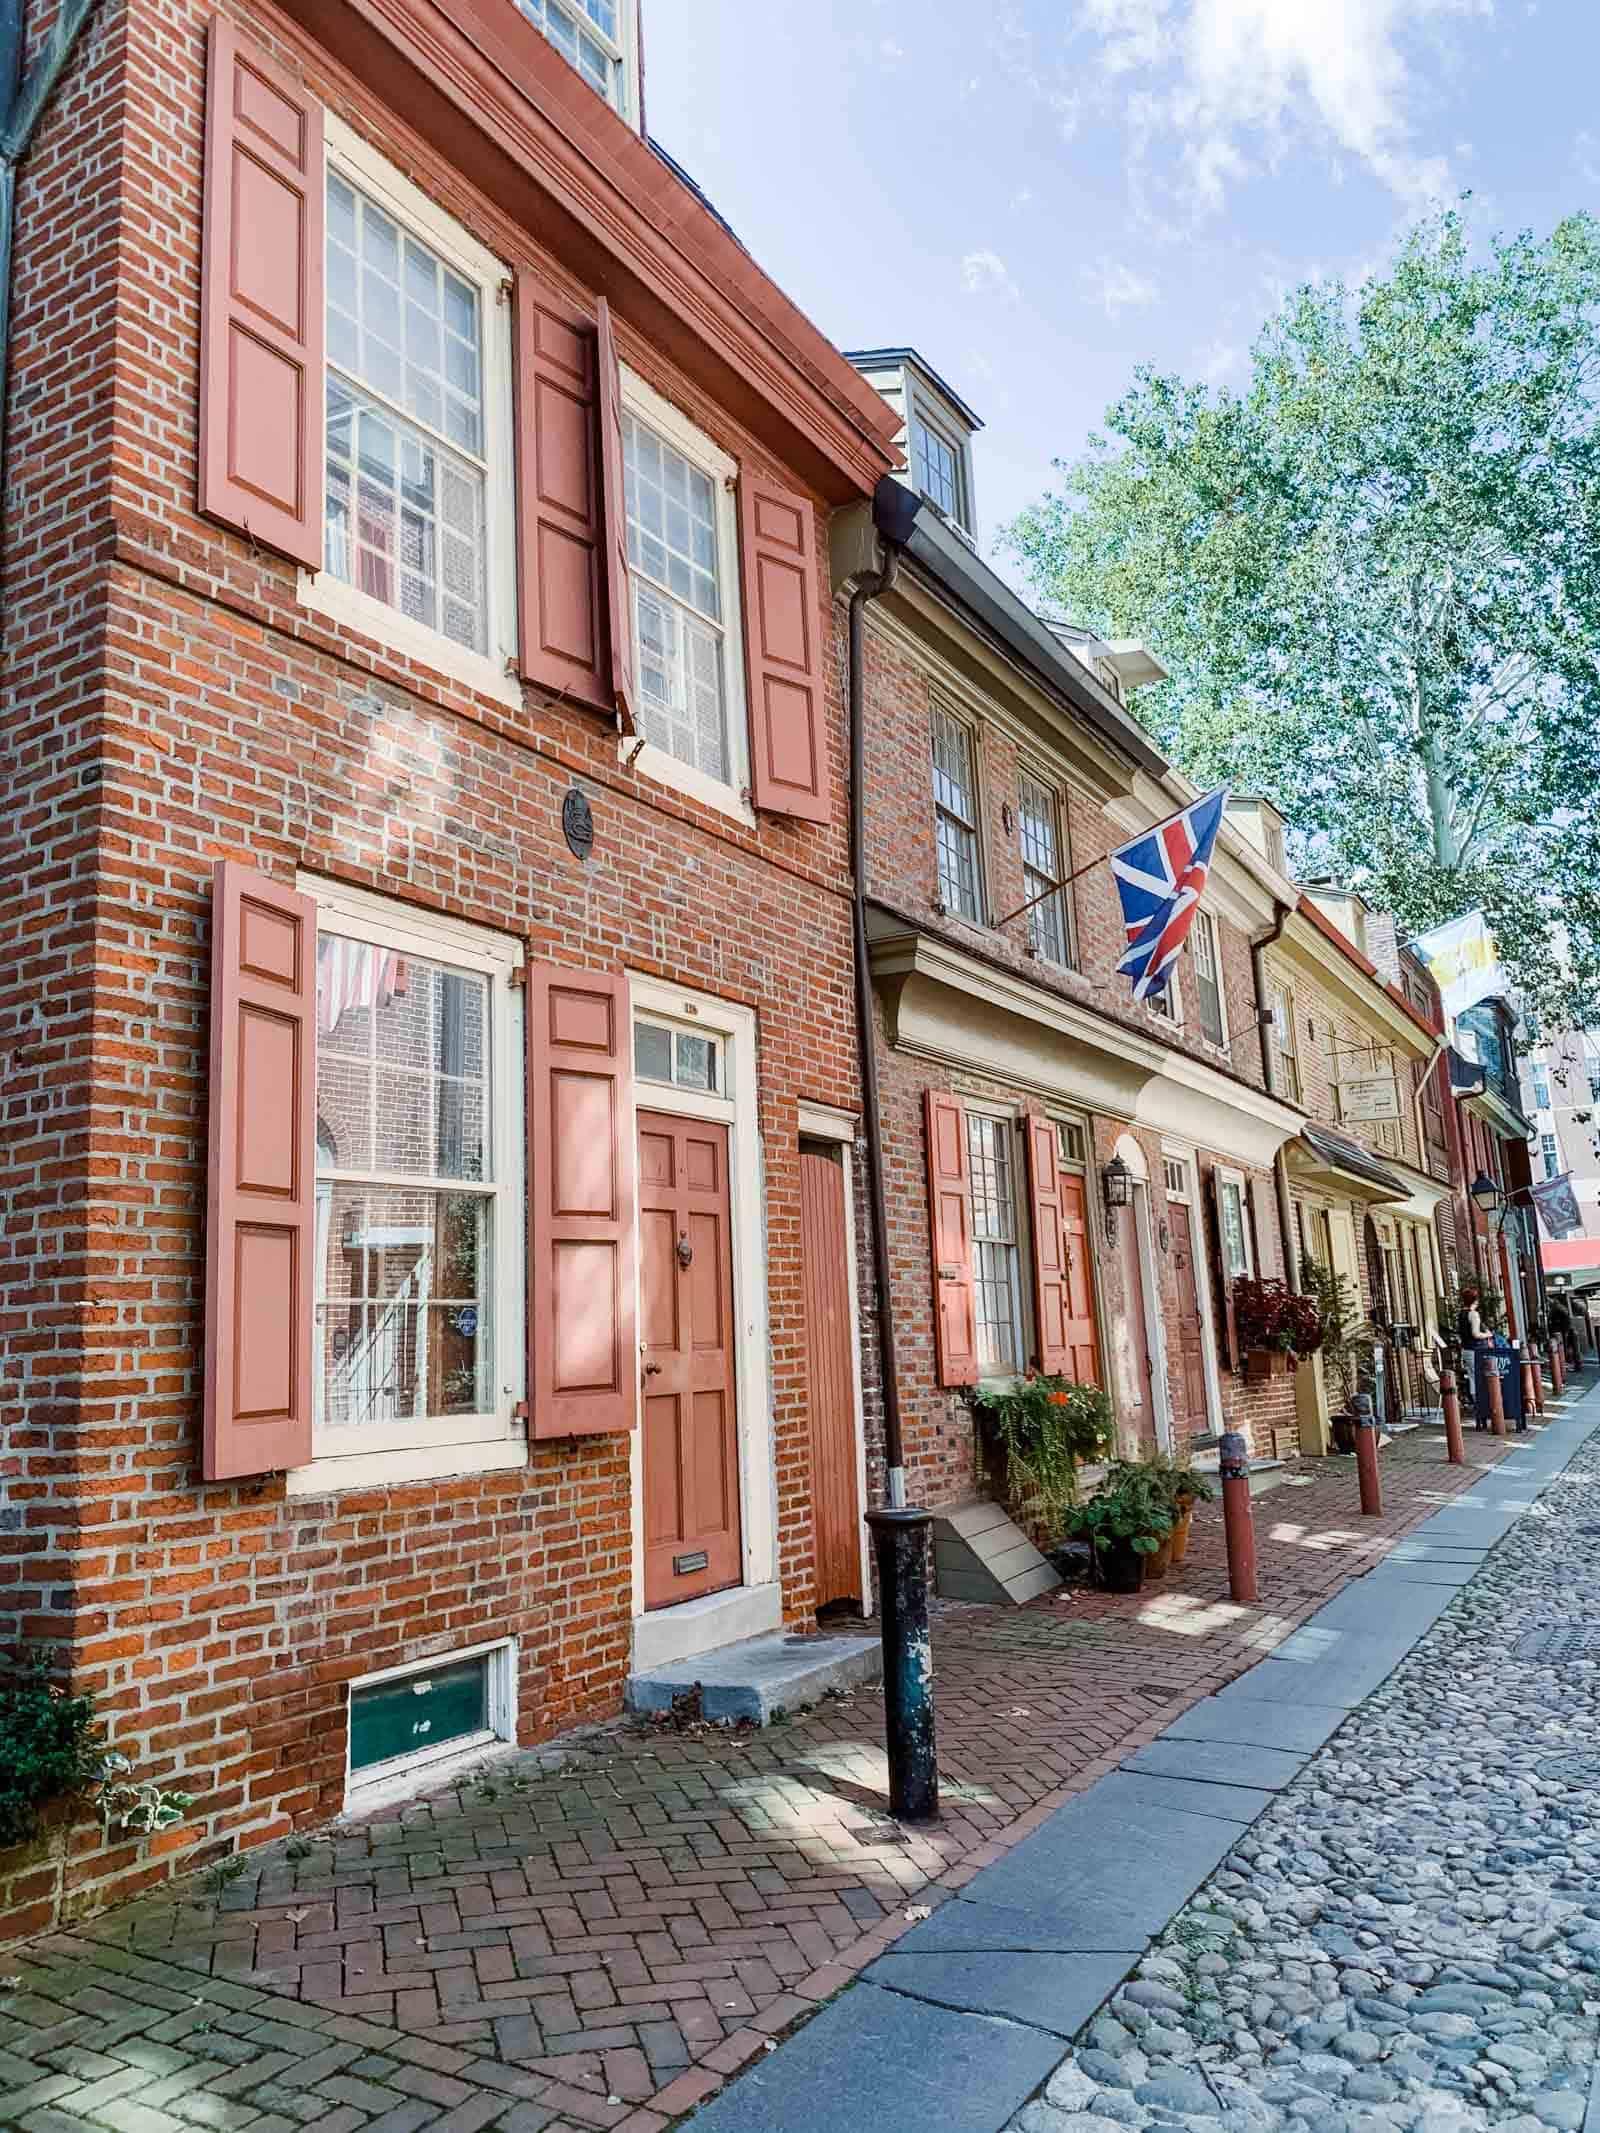 Philadelphia short itinerary